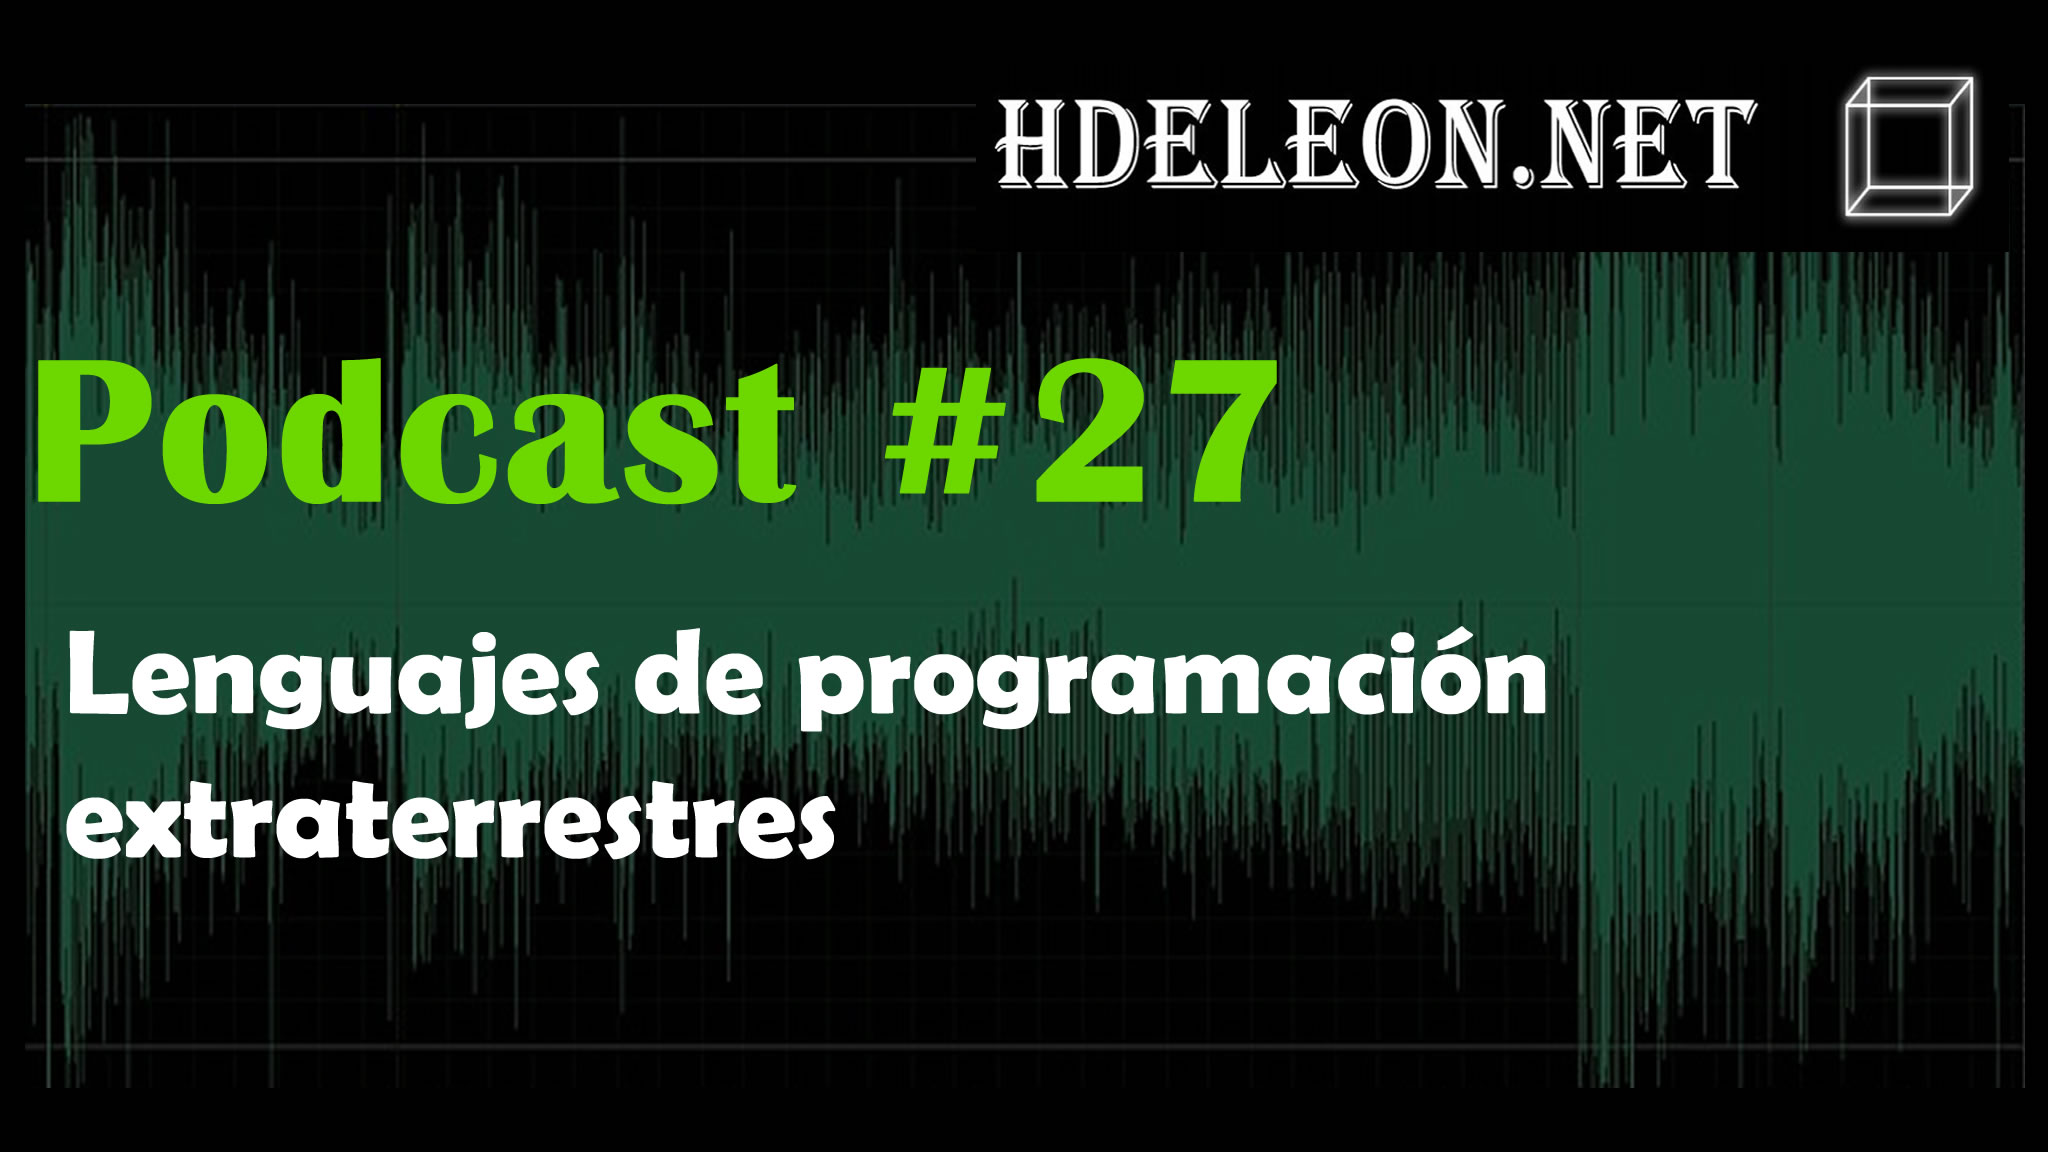 Podcast #27 – Lenguajes de programación extraterrestres